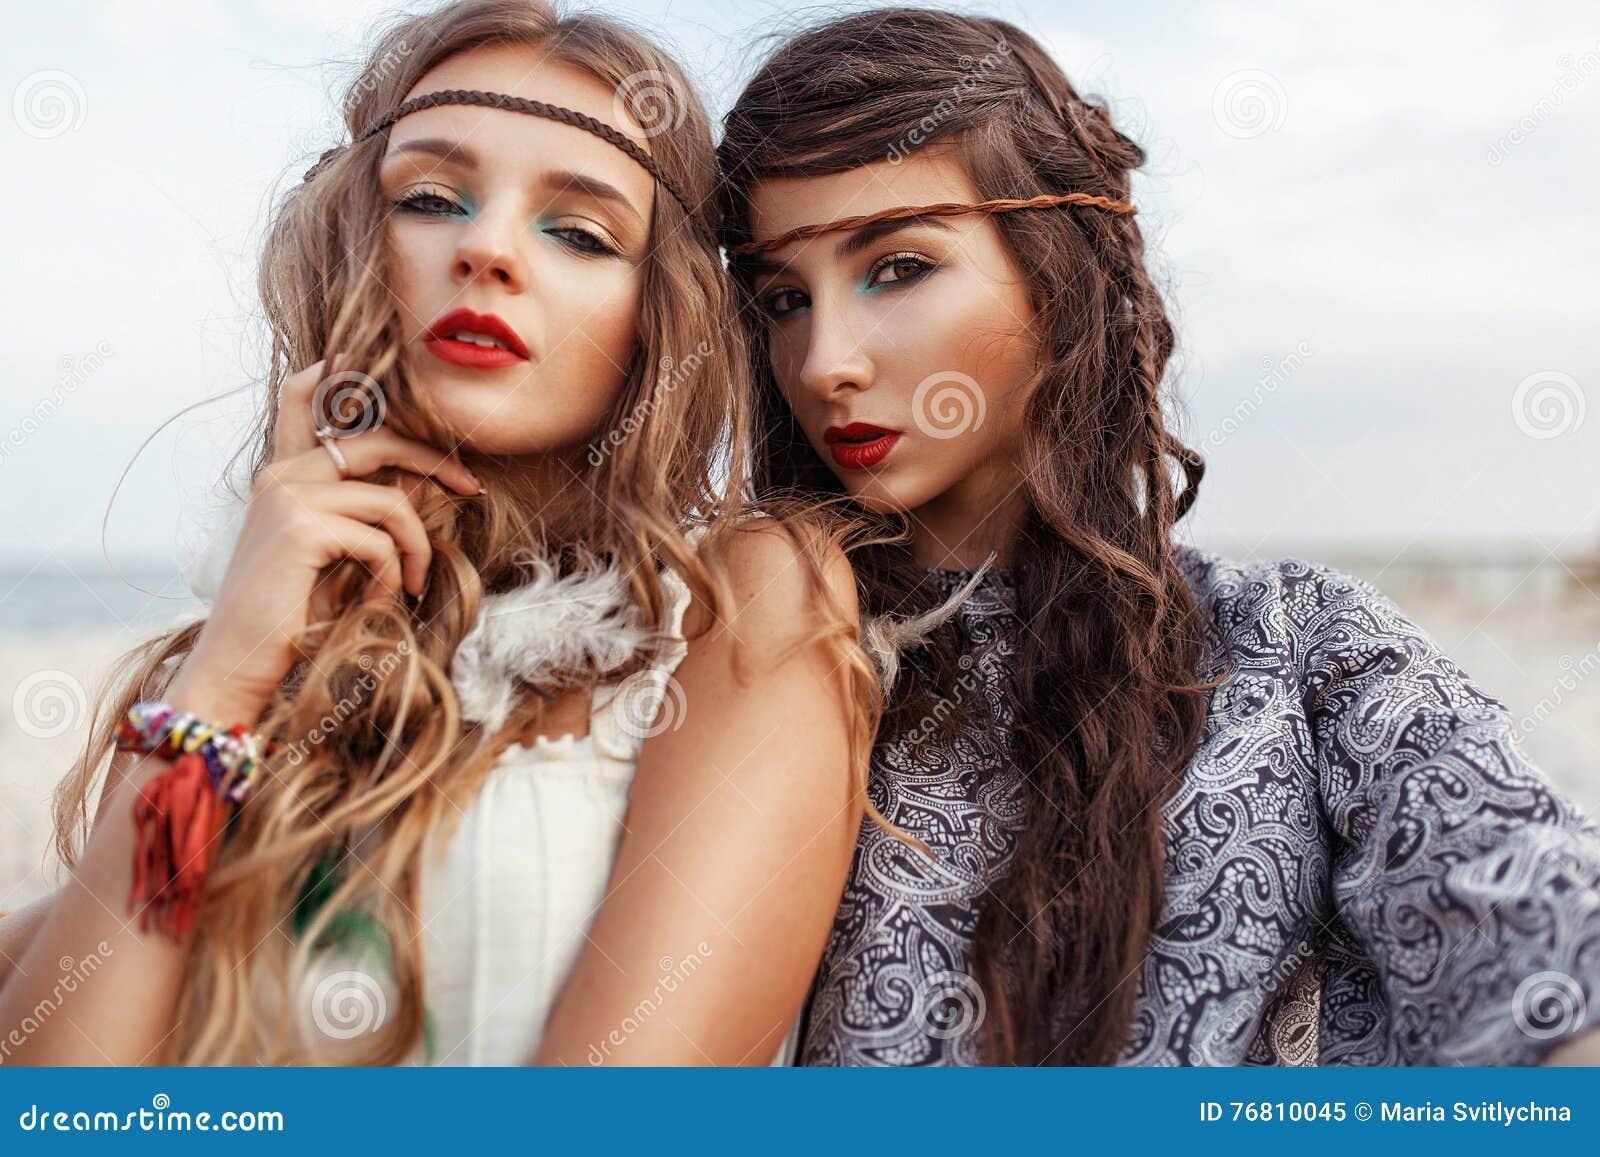 Dating ragazza hippie